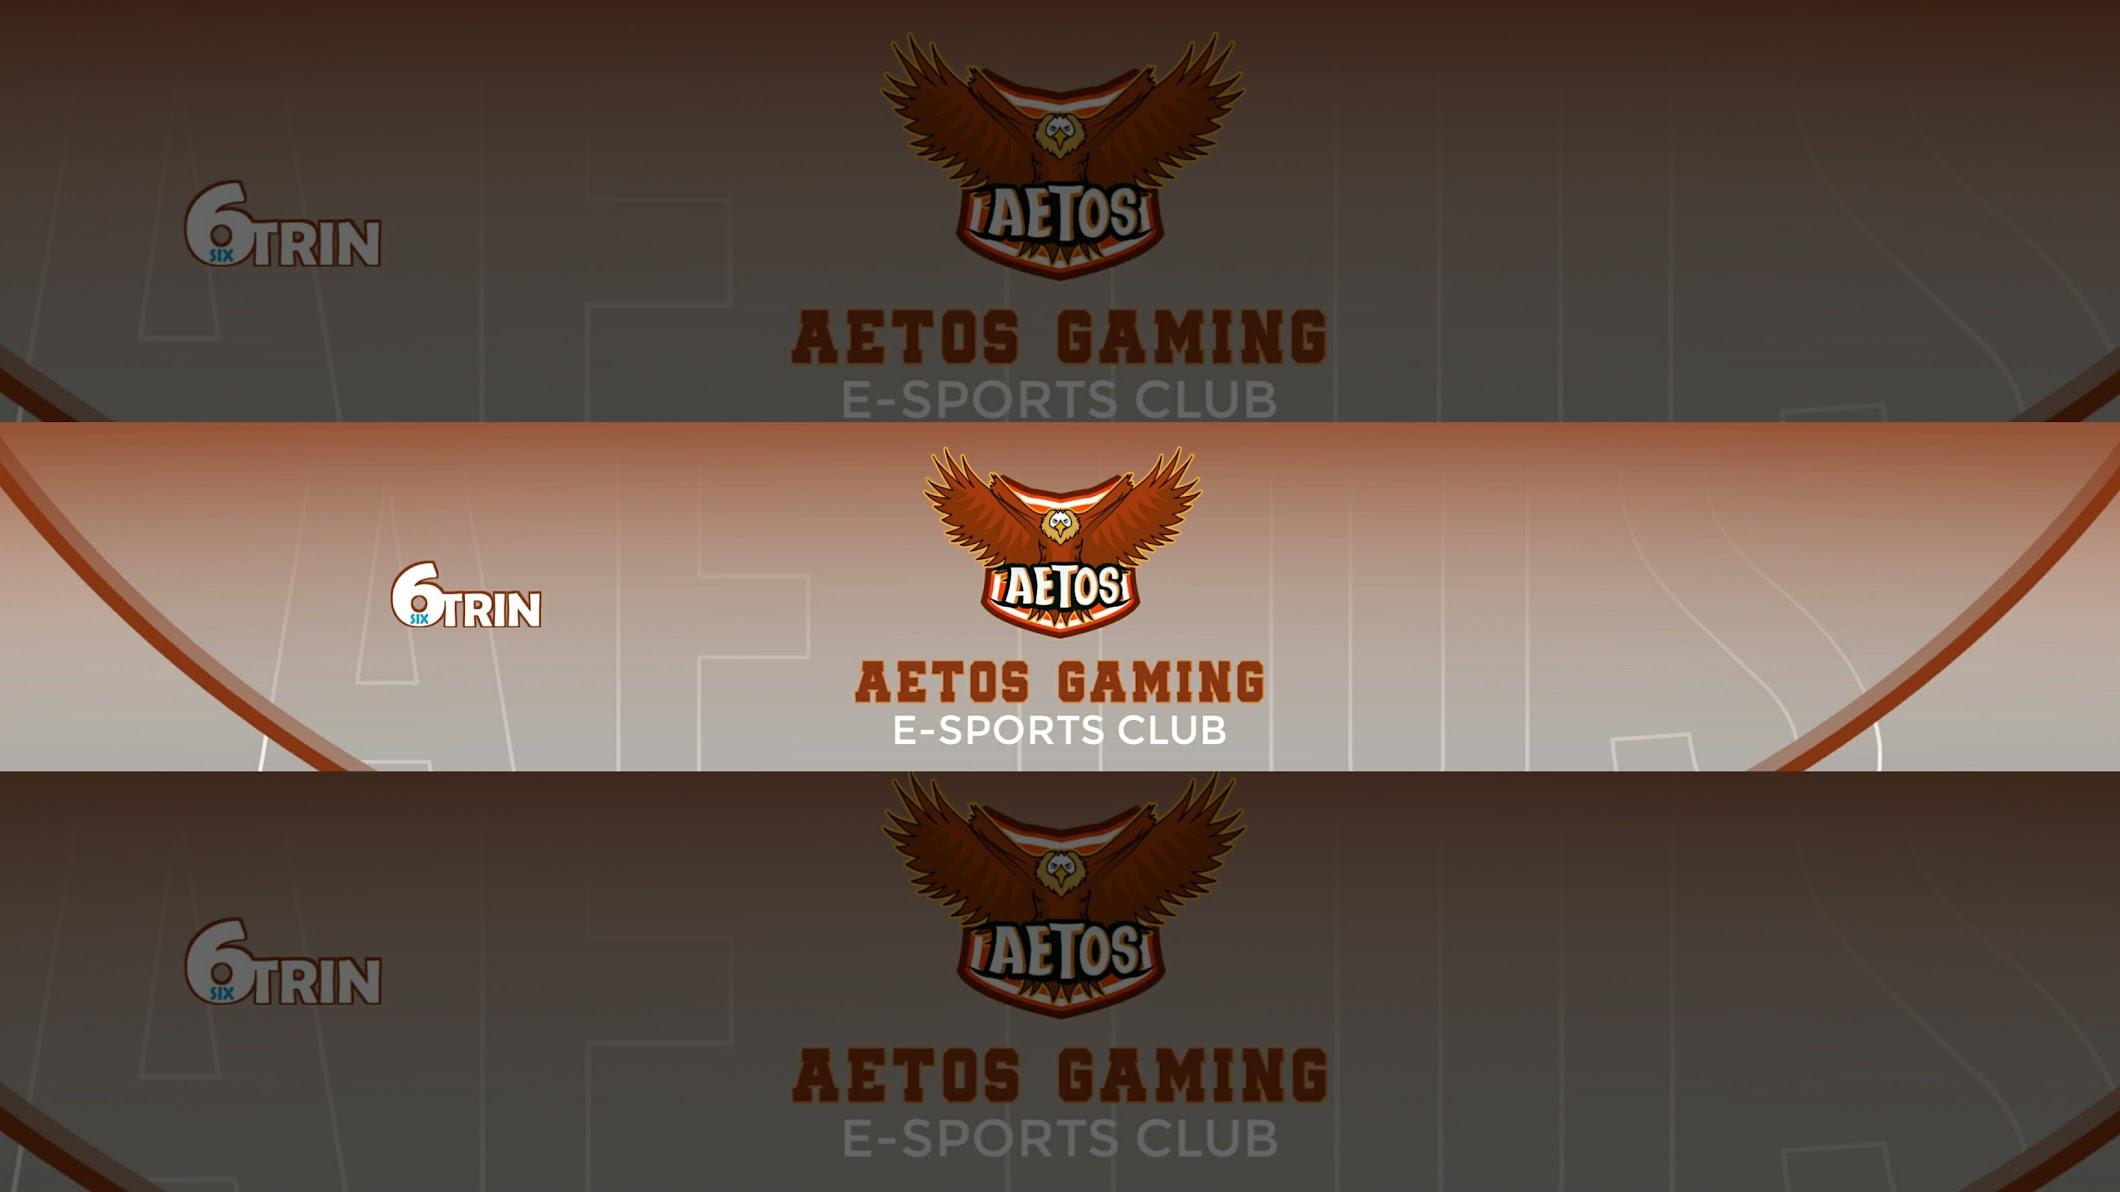 Aetos Gaming